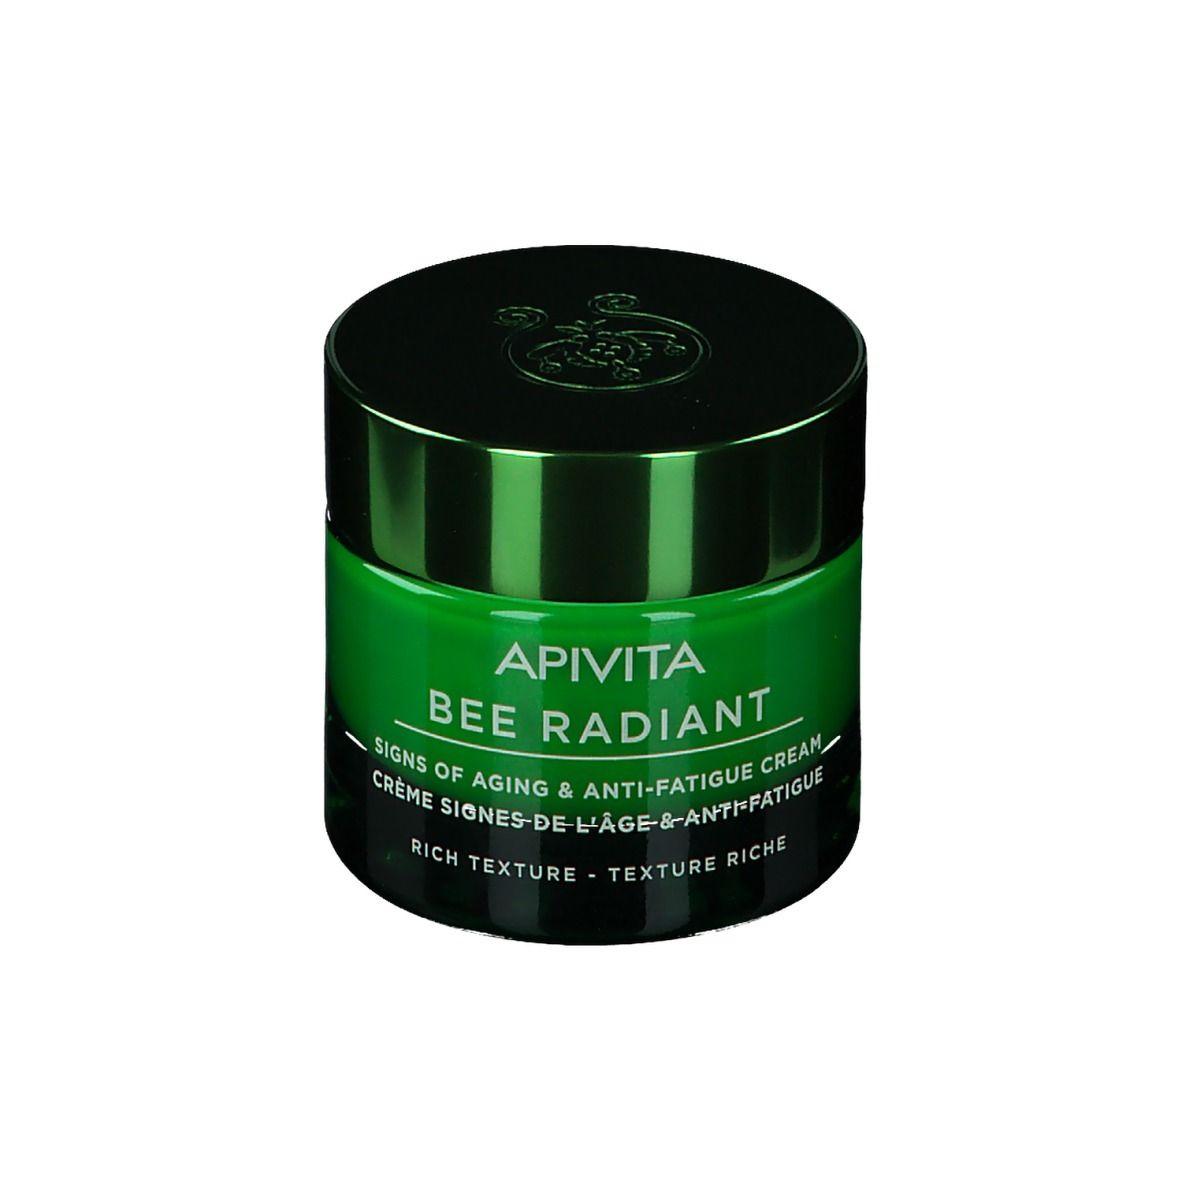 Image of APIVITA Bee Radiant Signs of Aging & Anti-Fatigue Gel-Creme reichhaltig